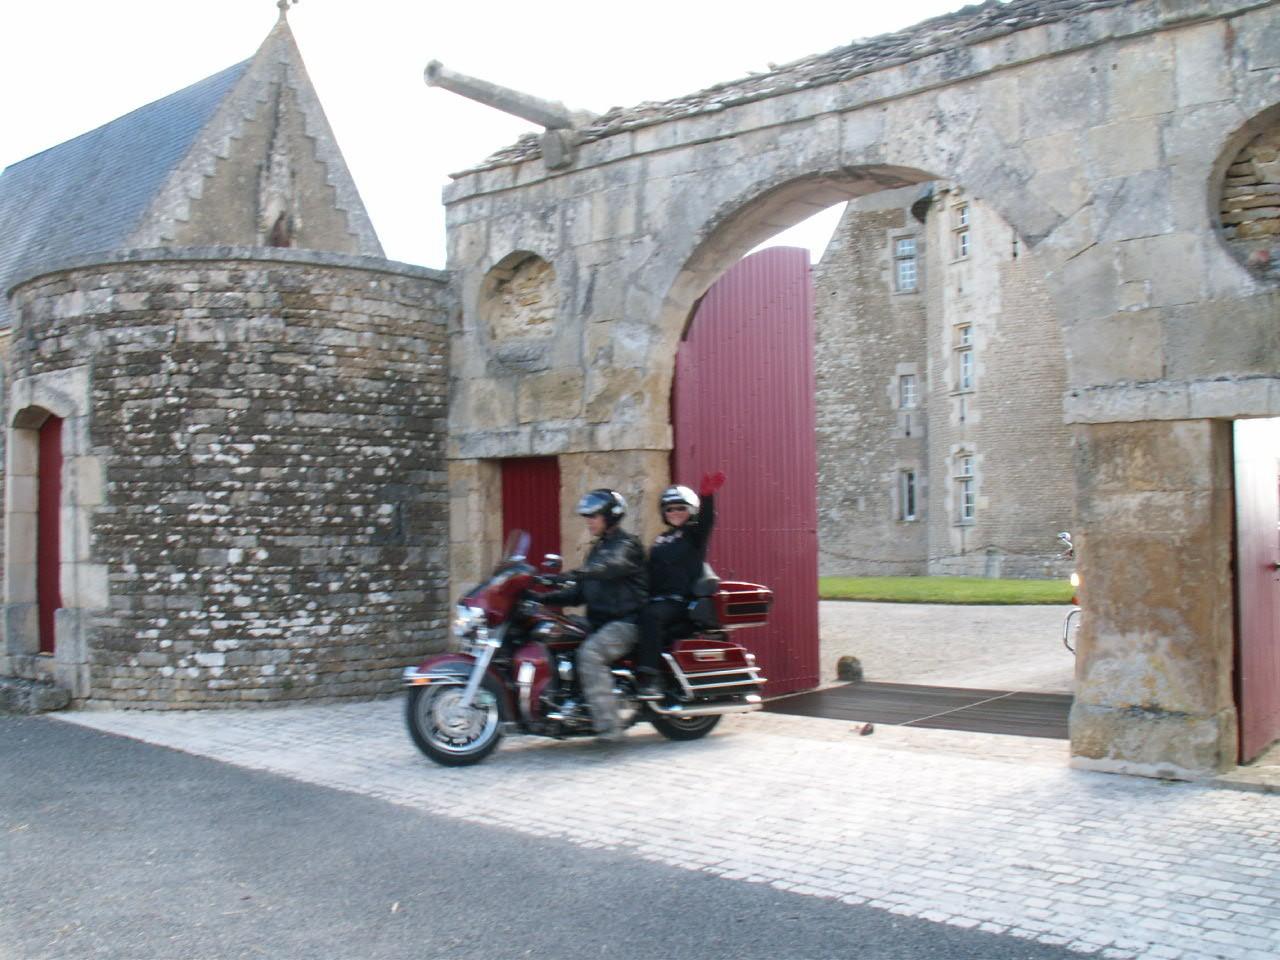 17/18 - Rallye Motos Harley-Davidson - Château de Saveilles ©photo-propriétaire